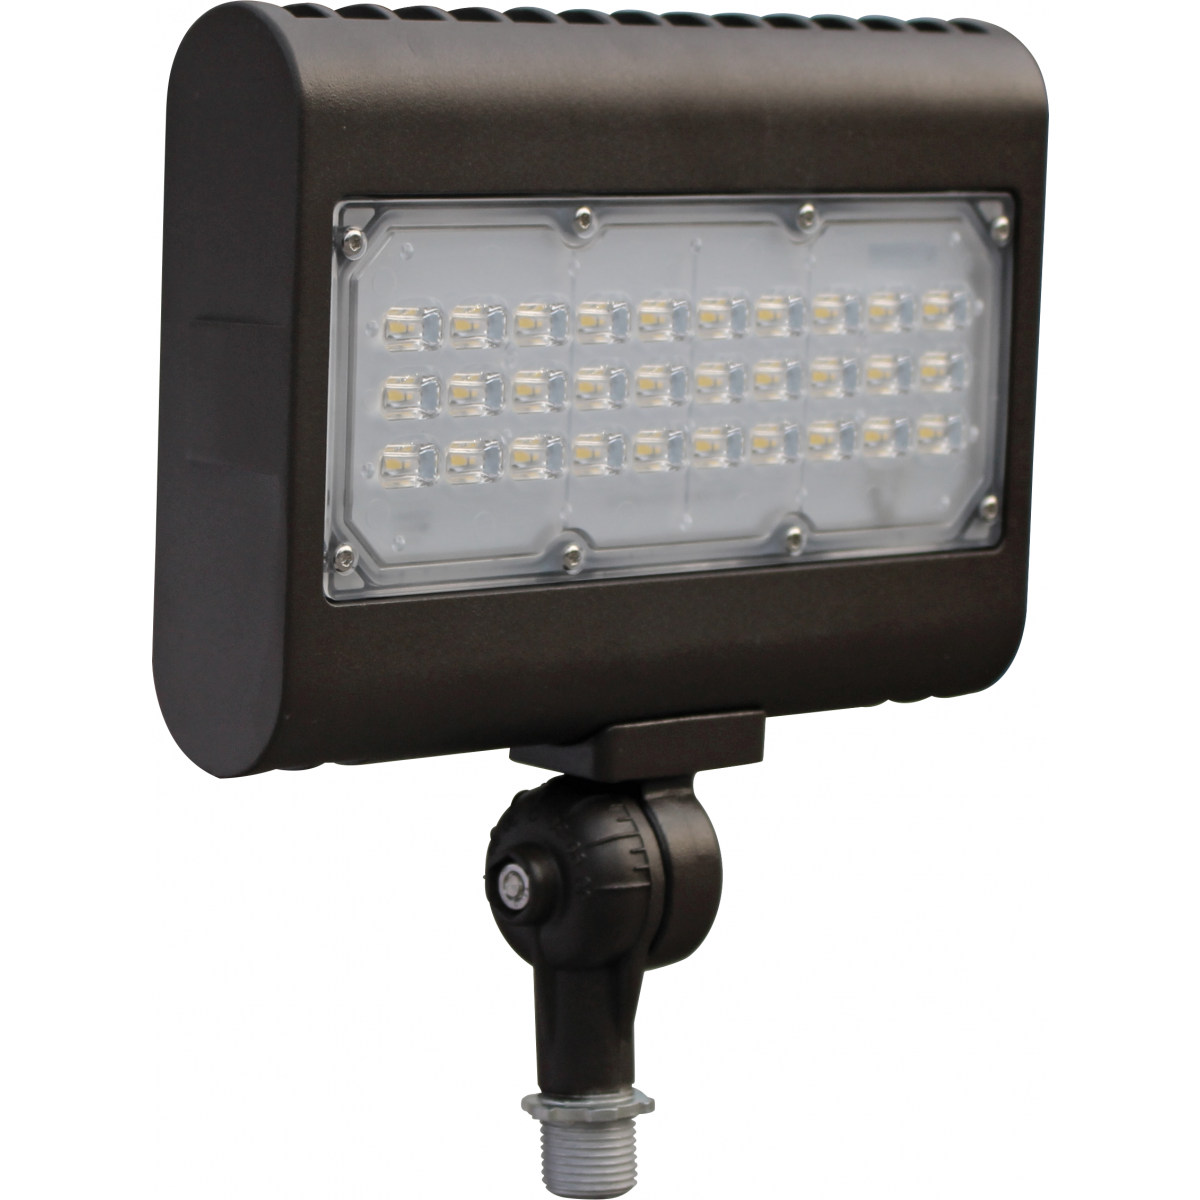 Lfl6 knuckle mount led flood lighting led lighting lfl6 50w kn aloadofball Choice Image